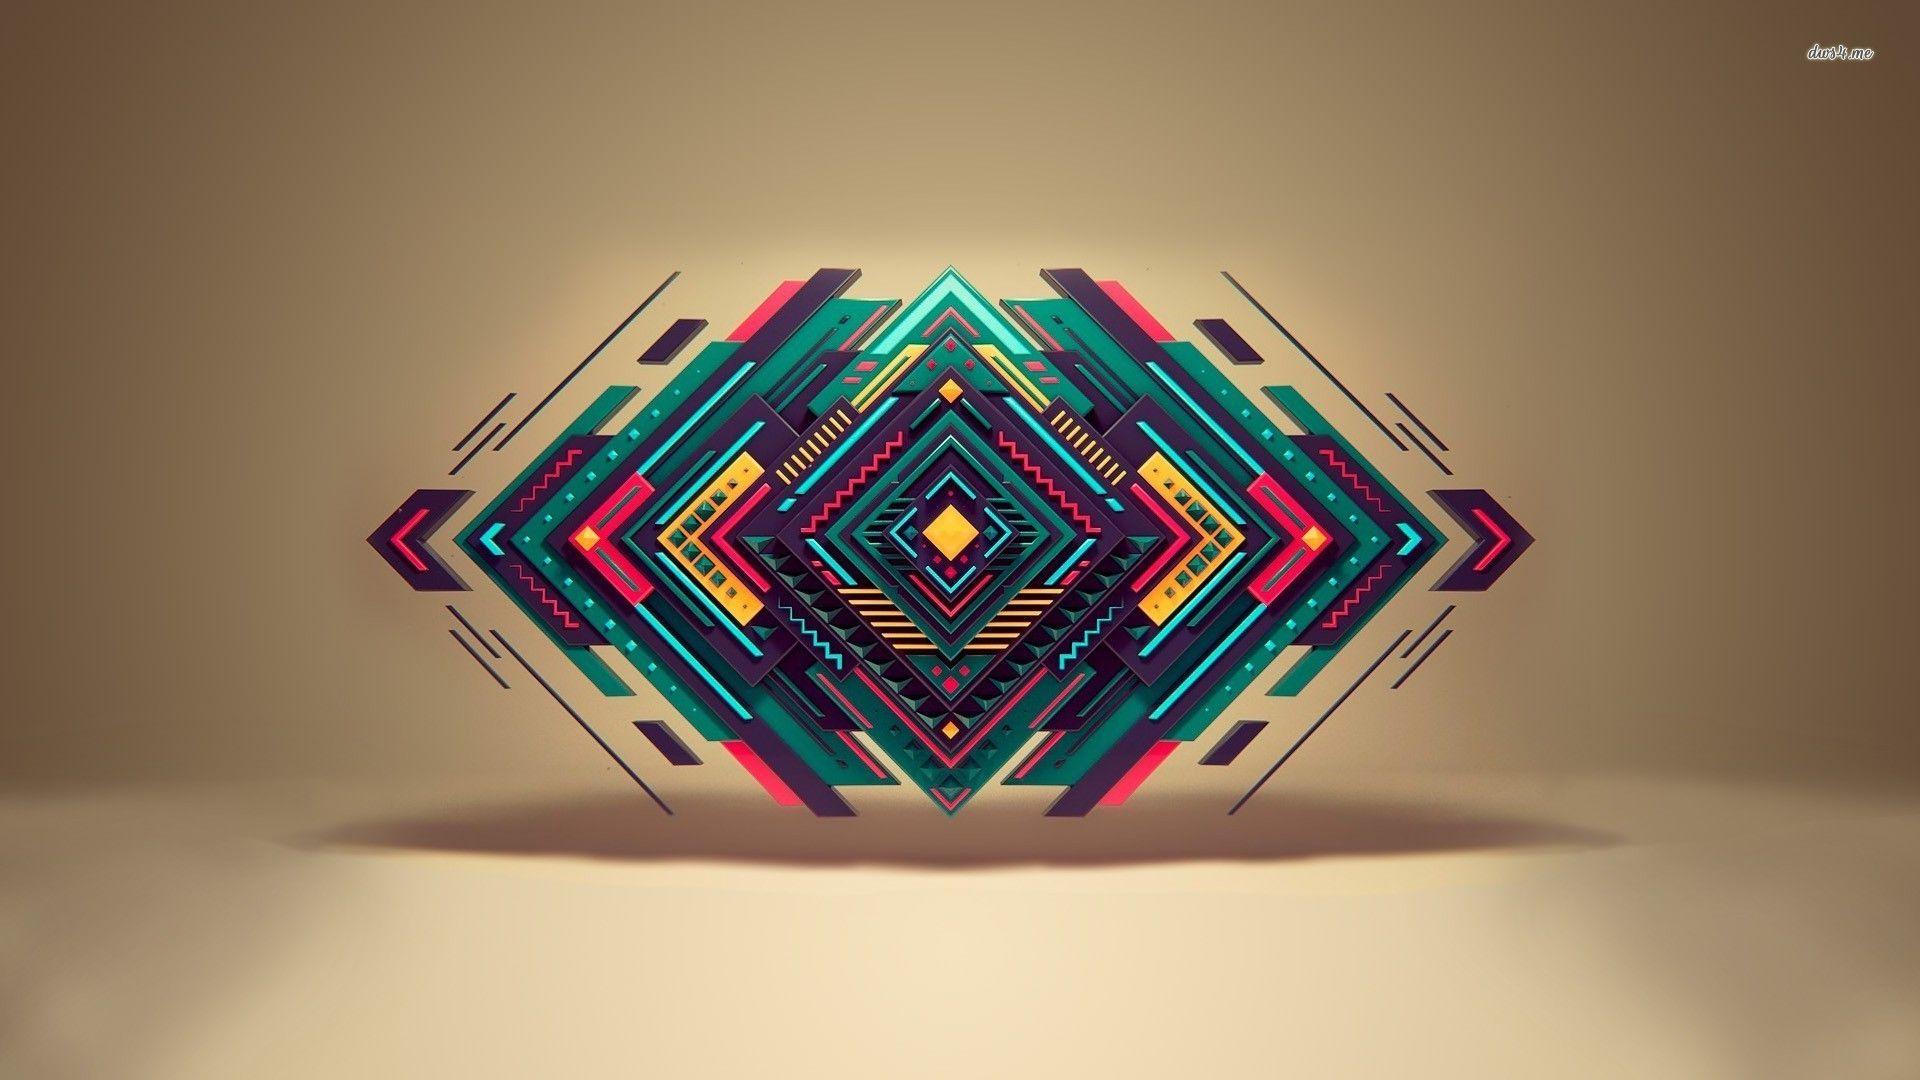 Best Wallpaper Macbook Geometric - fed99ff61fab507d8bed78ff869ed270  Snapshot_29330.jpg